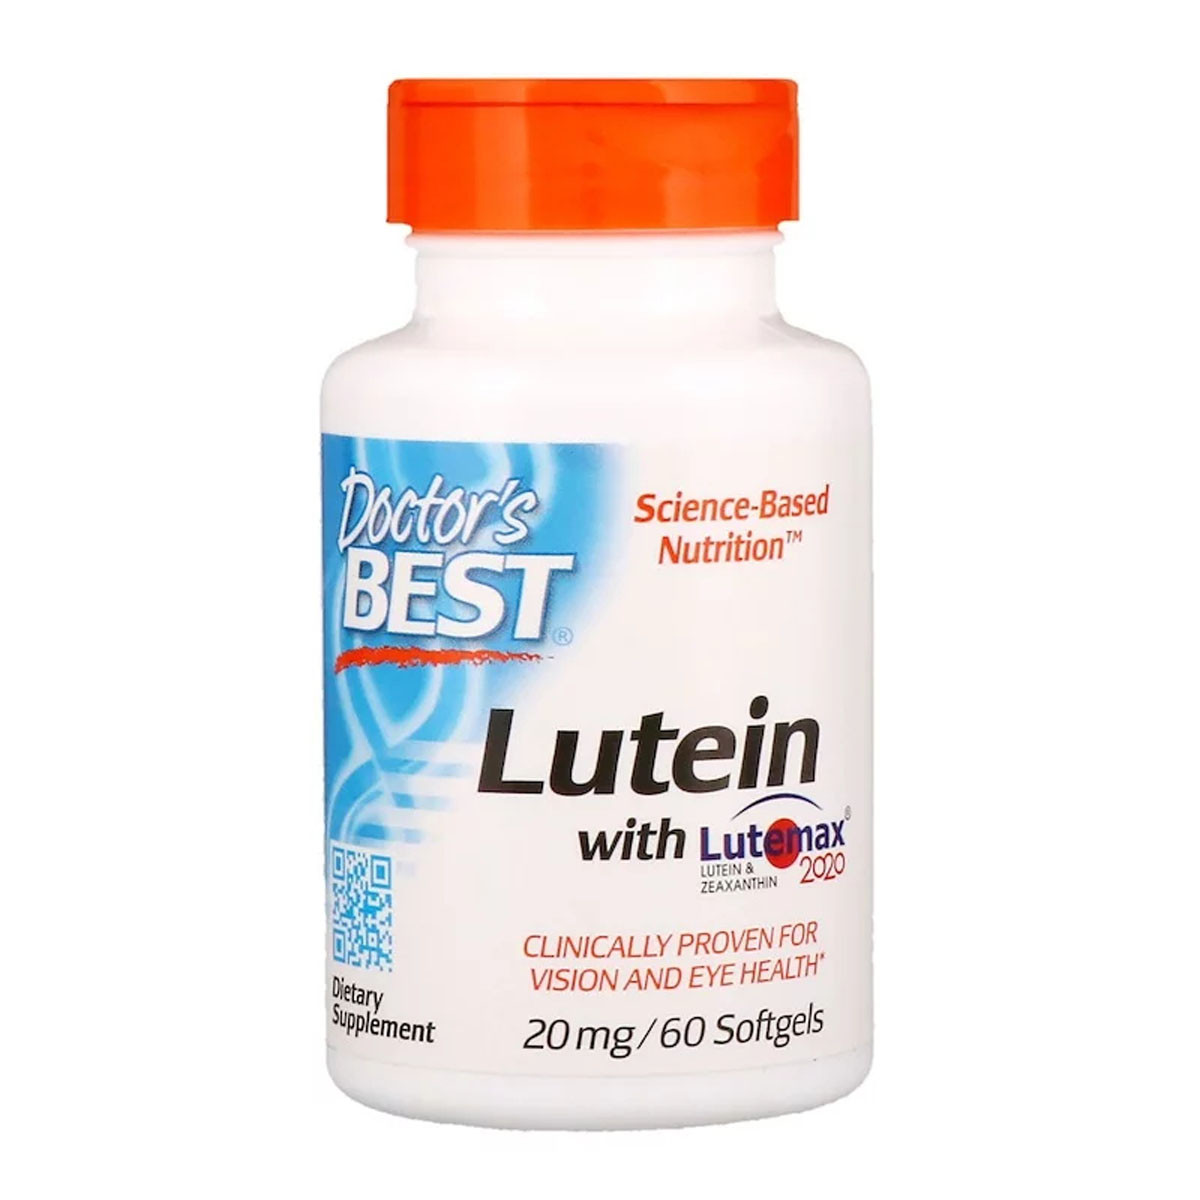 Лютеин, Lutein with Lutemax Doctor's Best, 20 мг, 60 желатиновых капсул